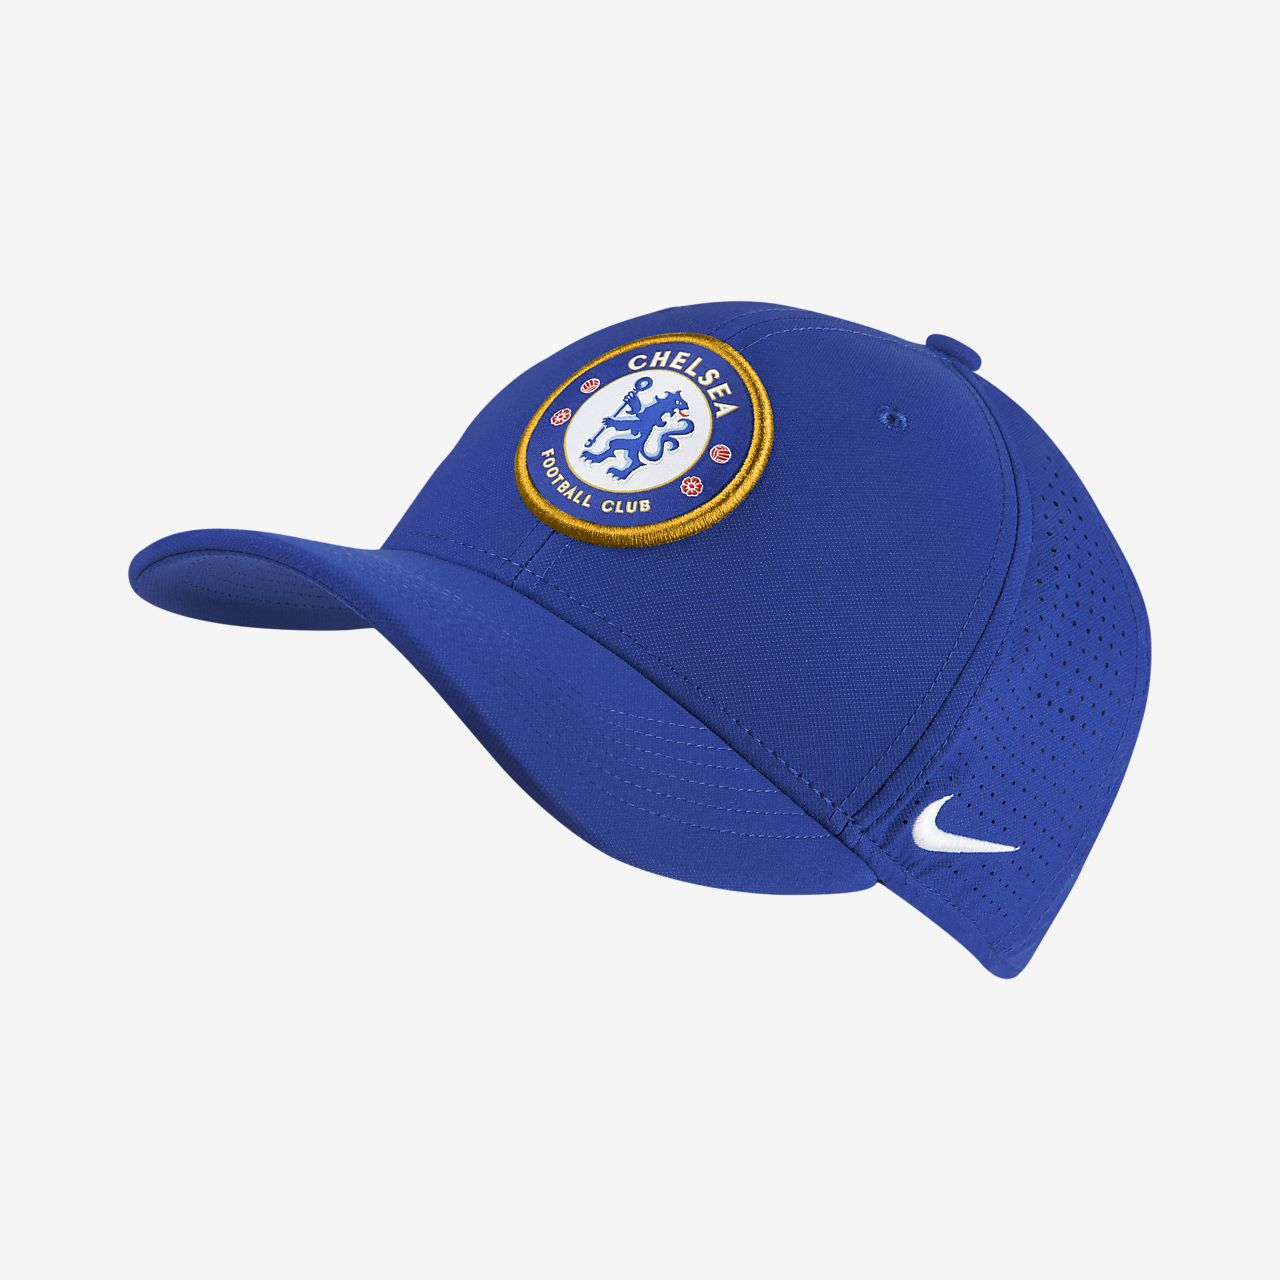 Chelsea Fc Hat Nike - Hat HD Image Ukjugs.Org 094394368c41